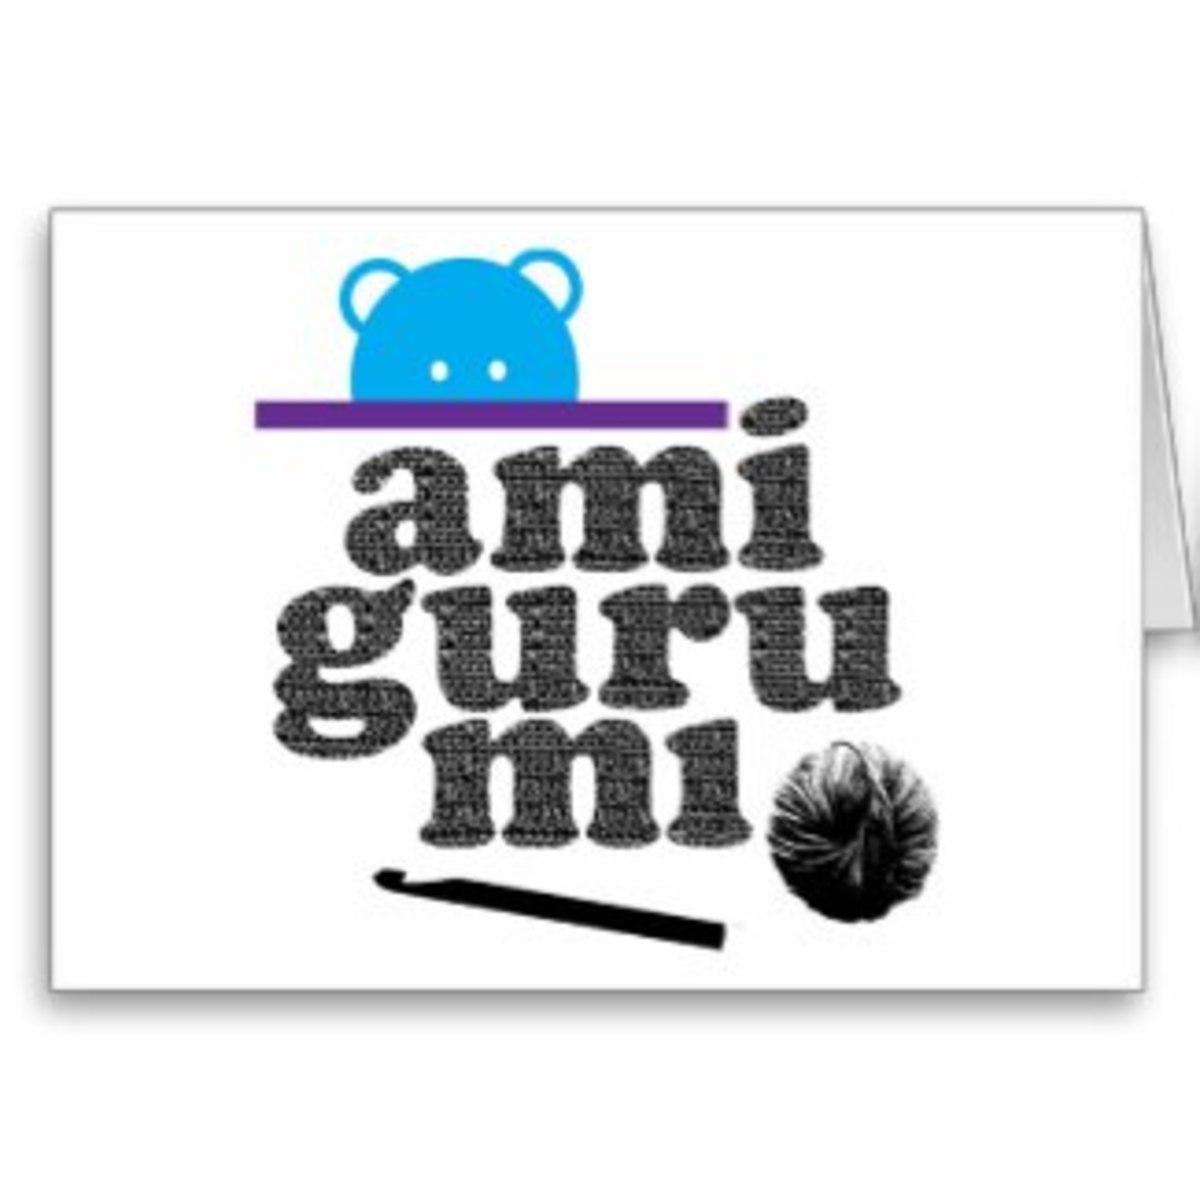 crafty-creative-crochet